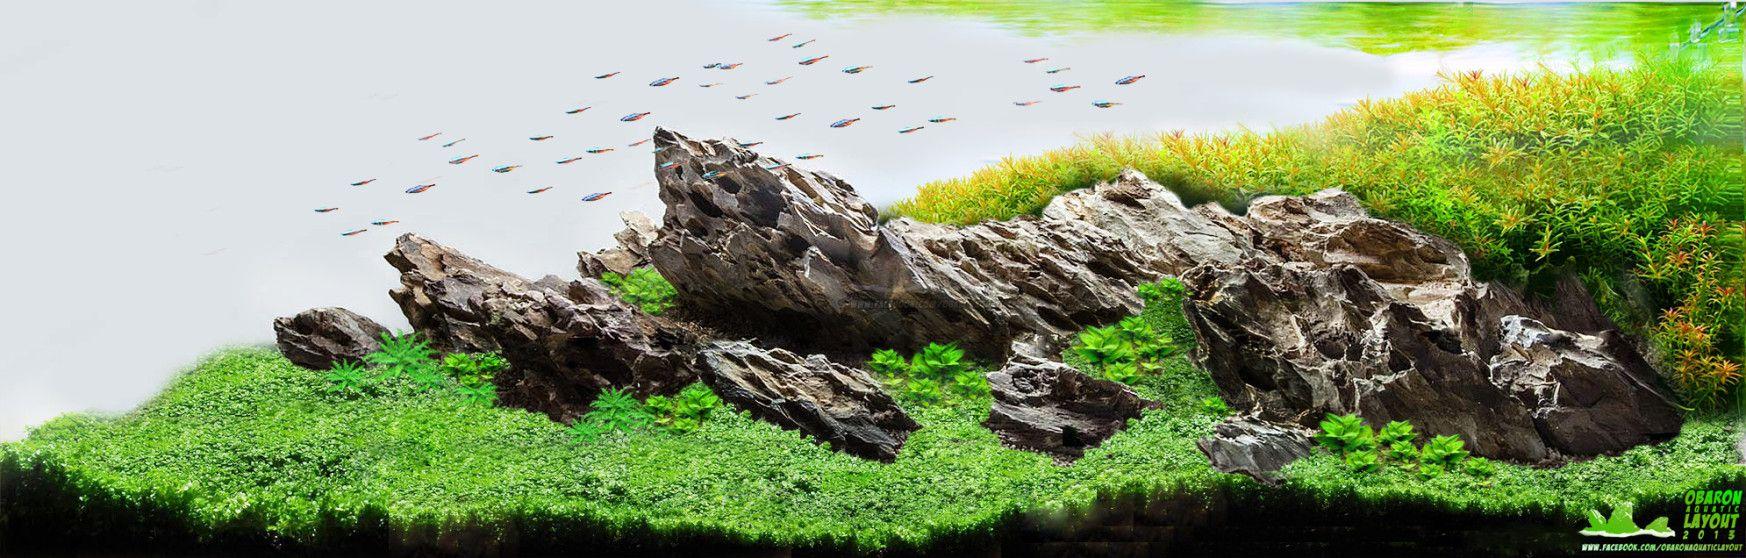 Ada Ohko Stone Aquascape Dragon Stone Aquascape Information Ohko Stone For Sale Dragon Stone For